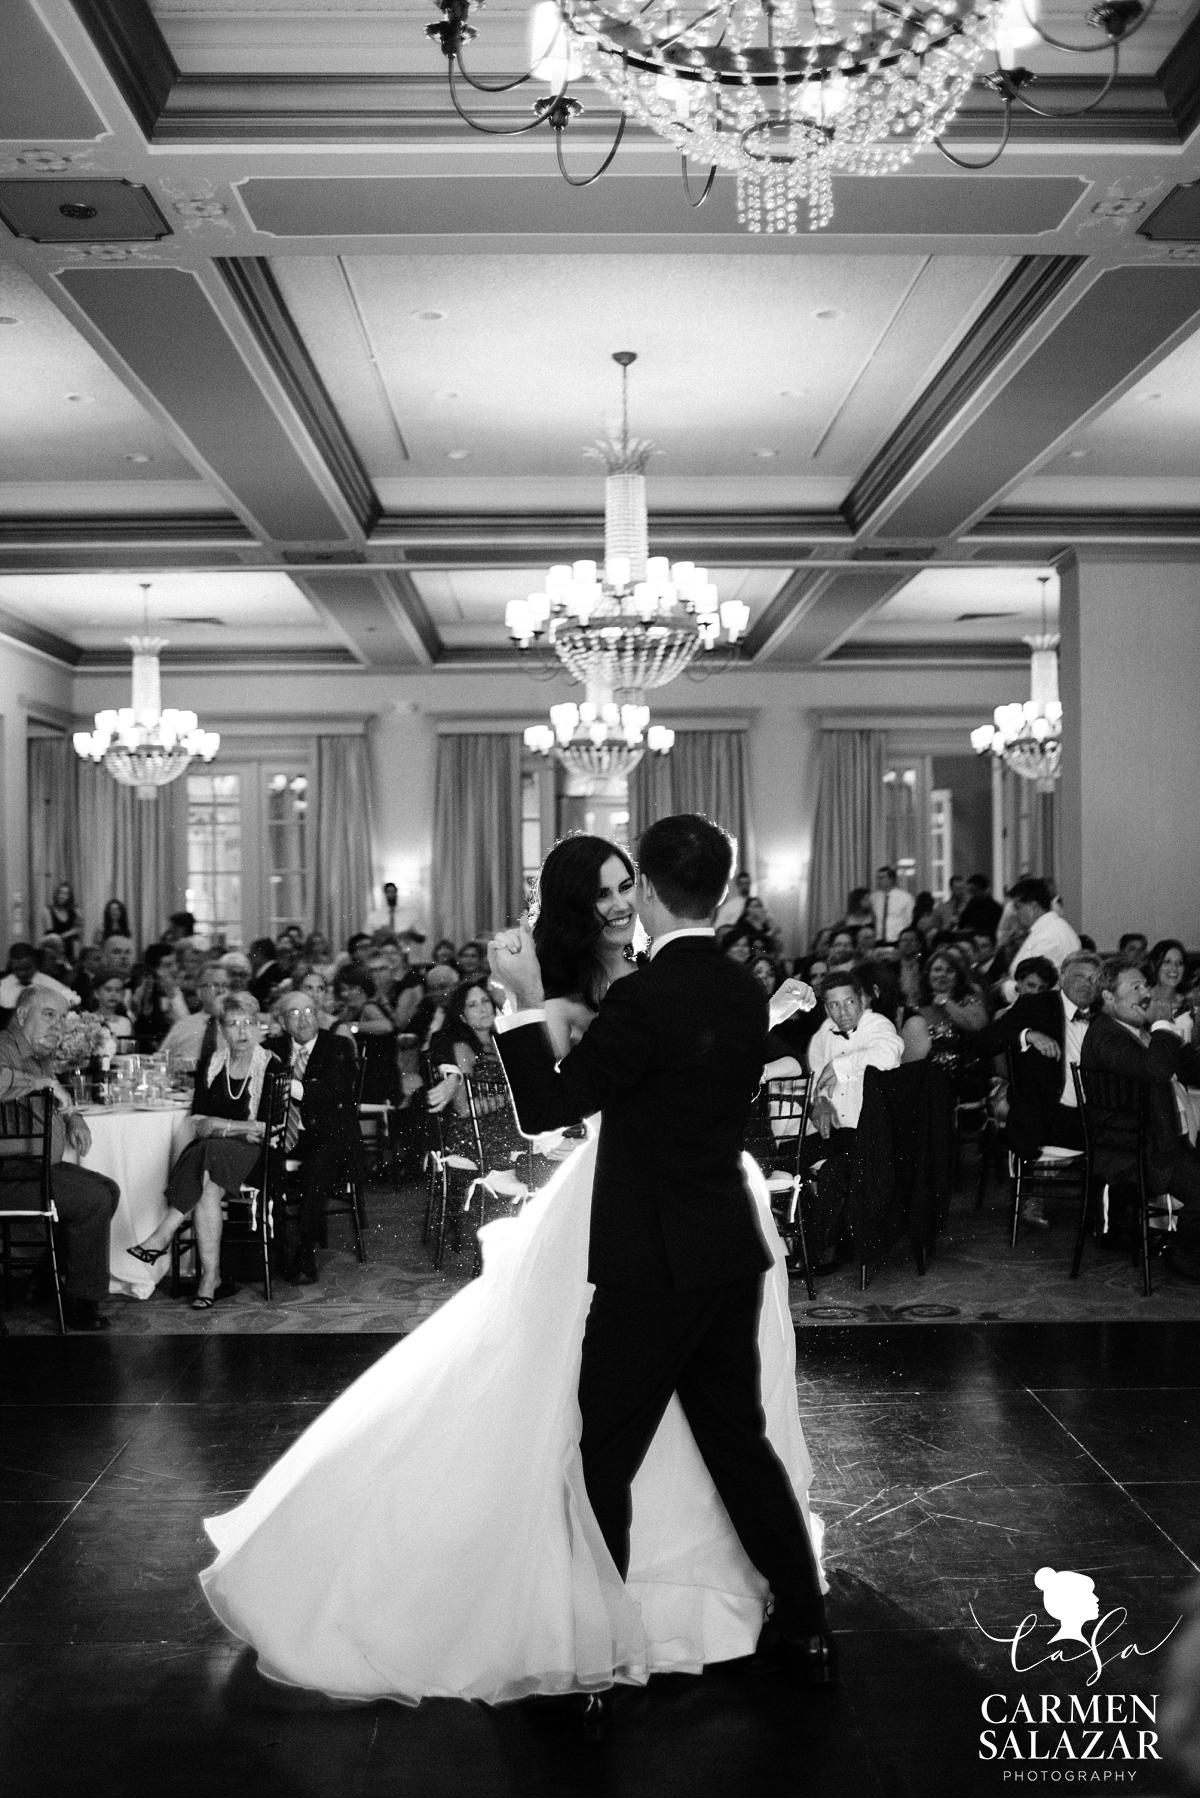 Classic ballroom wedding first dance - Carmen Salazar